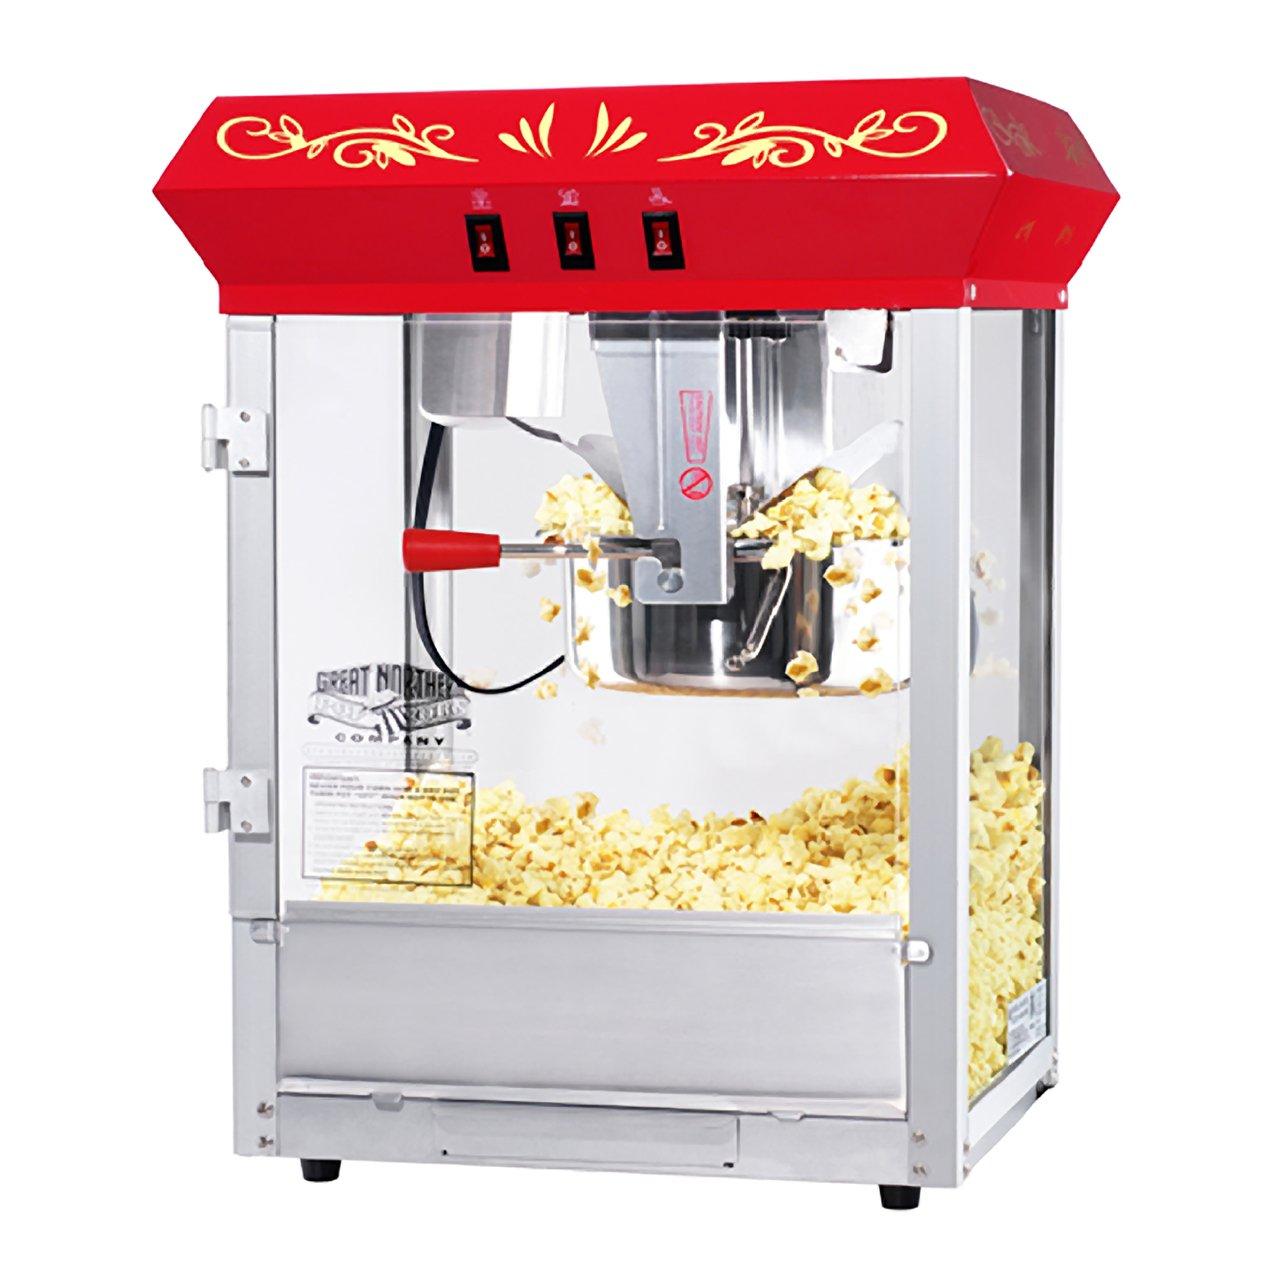 6100 Great Northern Popcorn Red Countertop Foundation Popcorn Popper Machine, 8 Ounce by Great Northern Popcorn Company